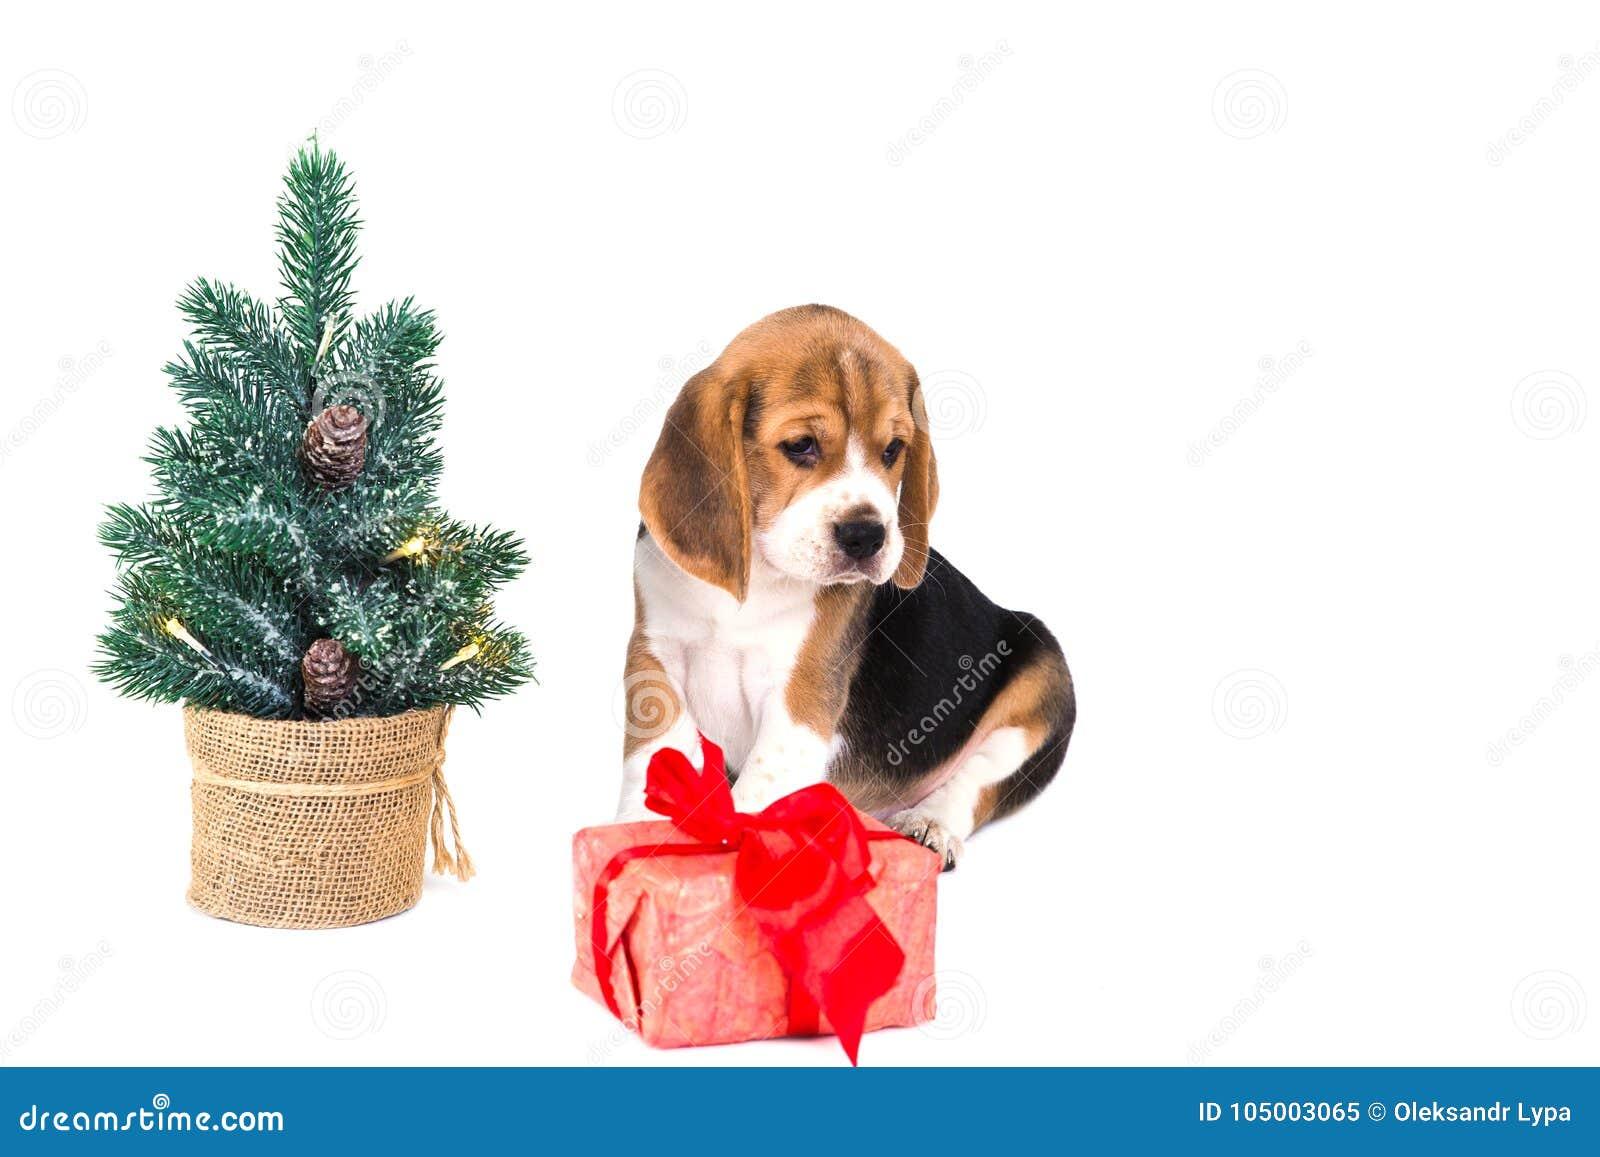 puppy beagle near christmas tree with pink box stock image image